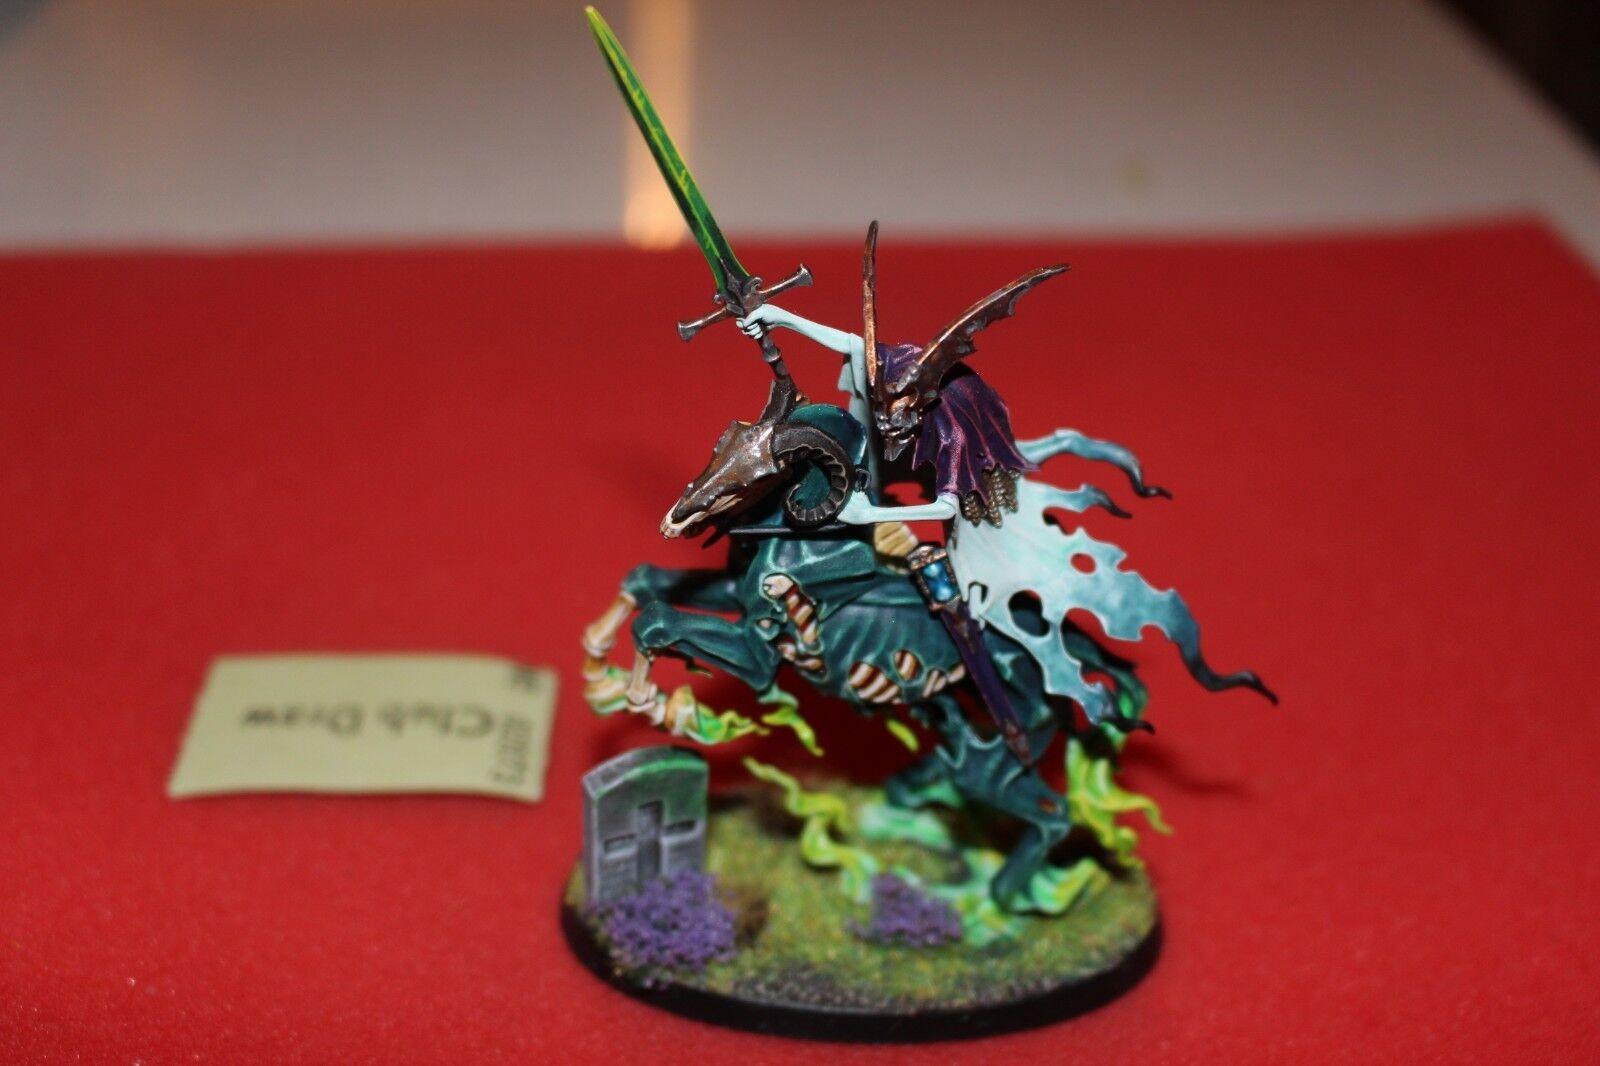 Spel arbetarhop Warhammer Nightspök Knight of Shrouds on Ethereal Steed Målad